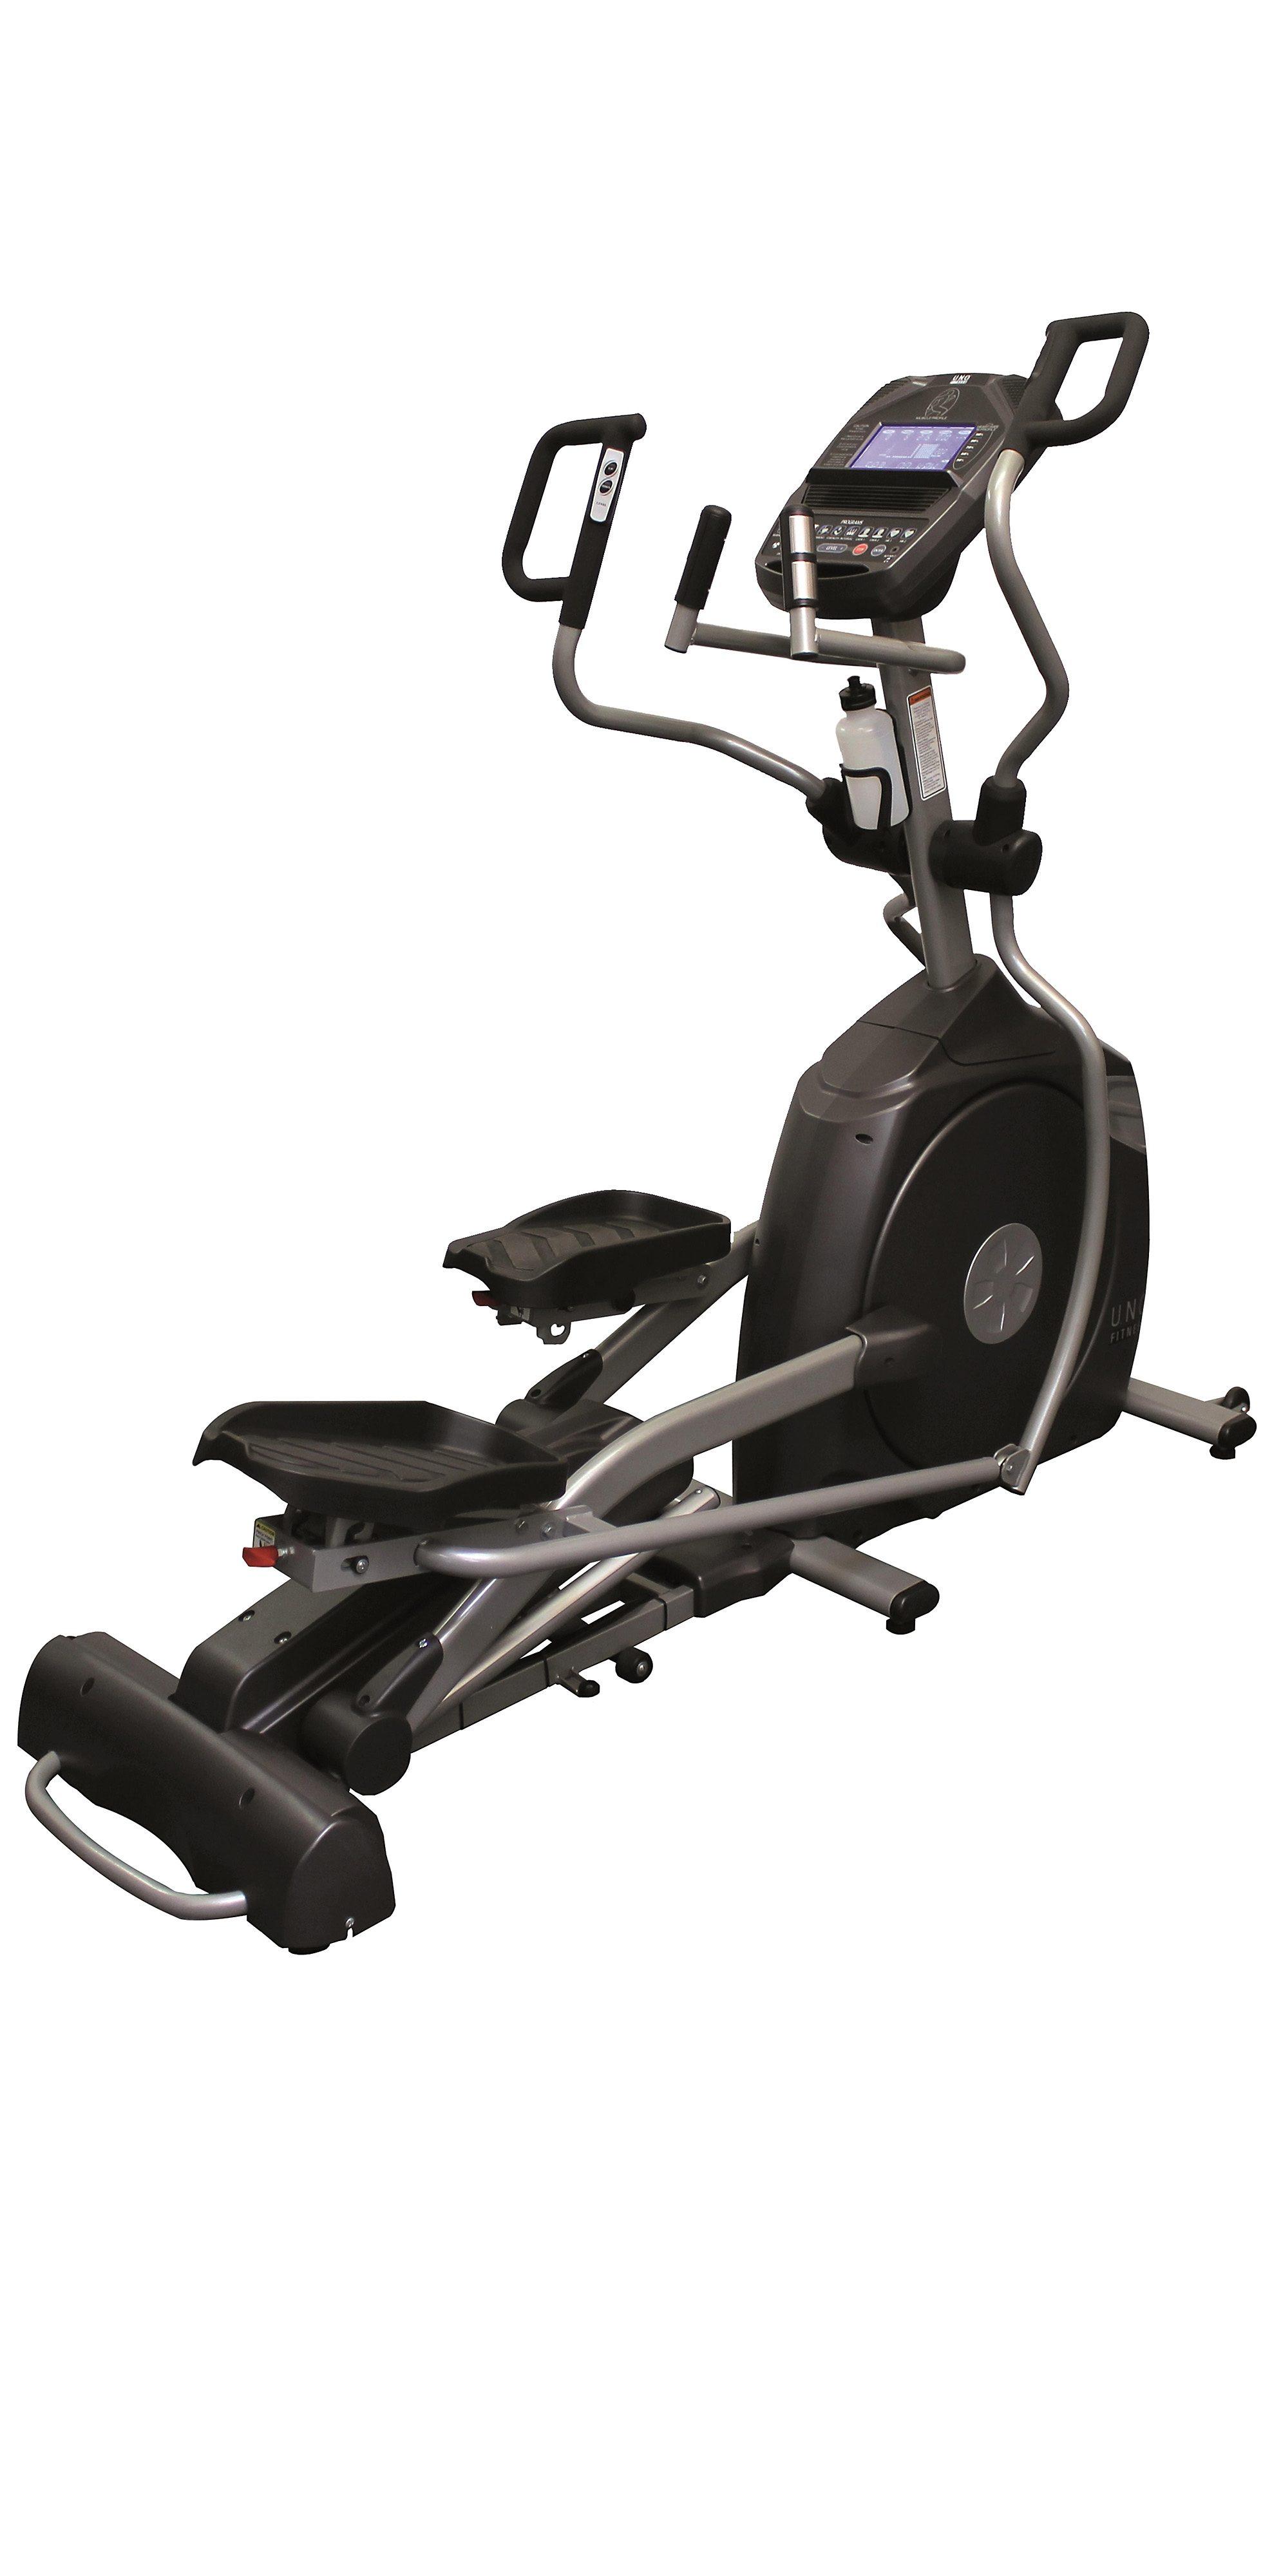 U.N.O. Fitness UNO FITNESS Crosstrainer-Ergometer Crosstrainer XE 51 Technik & Freizeit/Sport & Freizeit/Fitnessgeräte/Crosstrainer